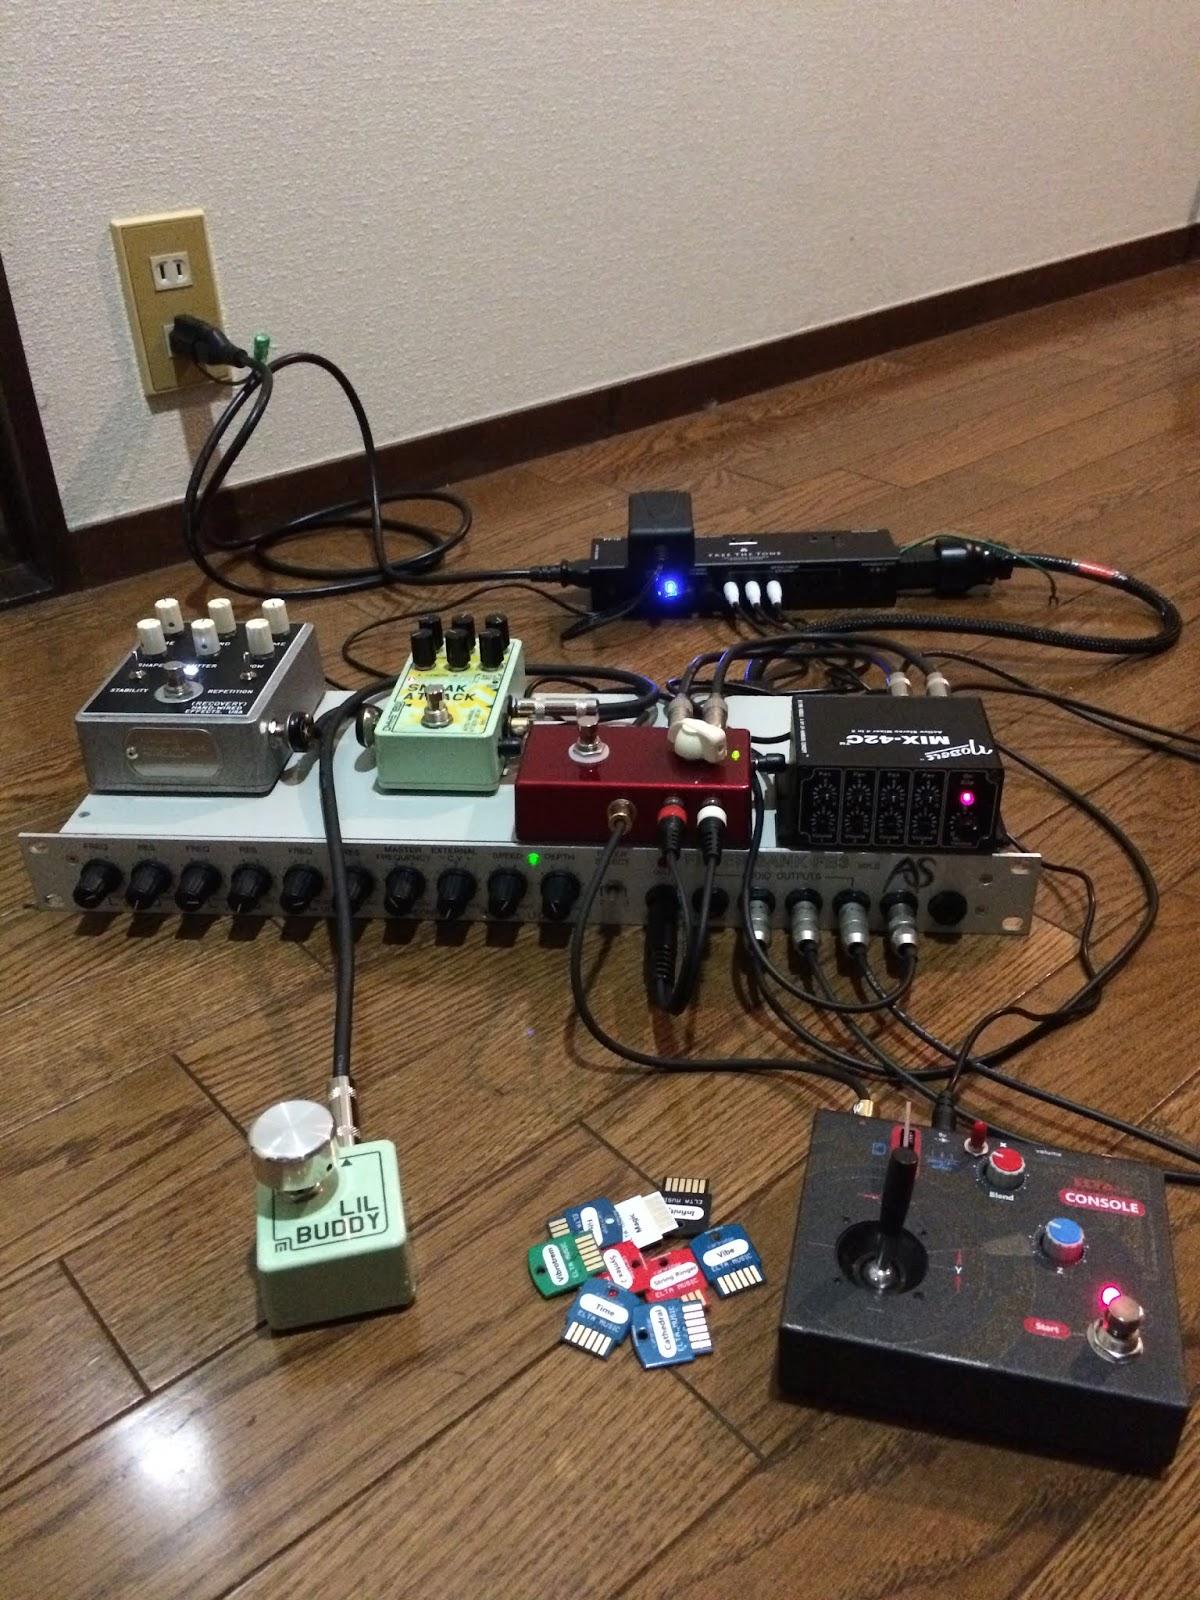 brass amplifier: 三が日の '実験日和'